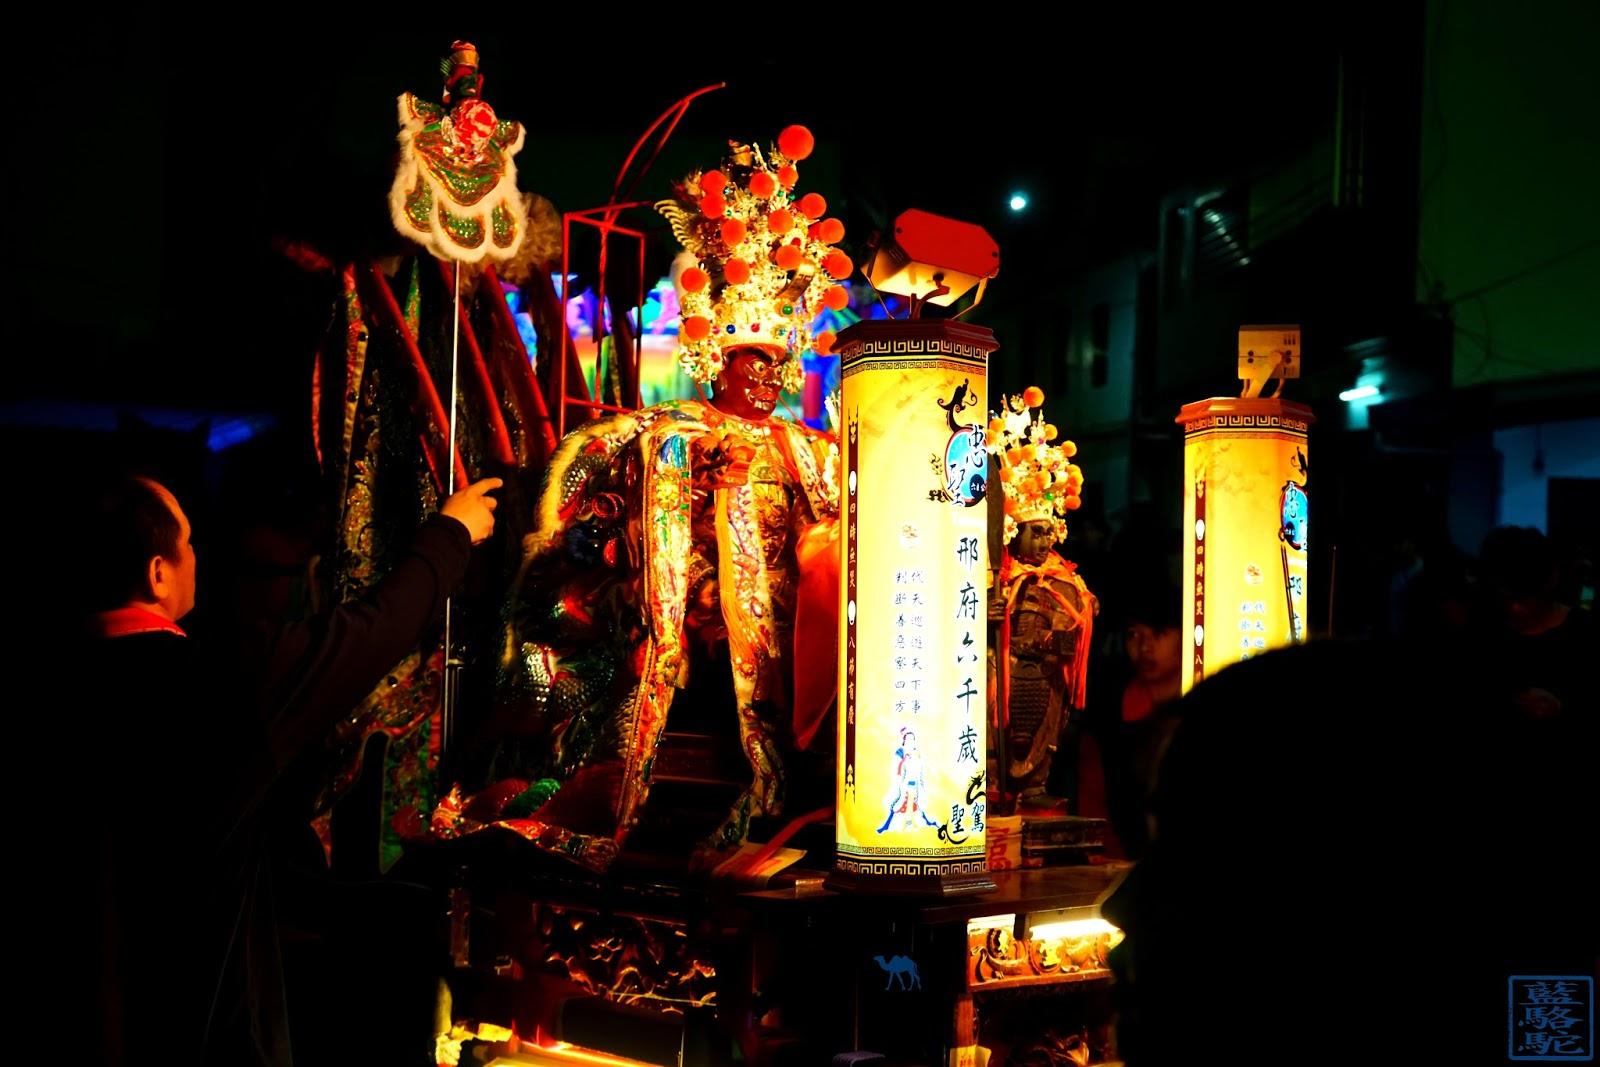 Le Chameau Bleu - Blog Voyage Taitung Taiwan - Palanquin de Taitung - Parade de Taiwan - Séjour à taiwan